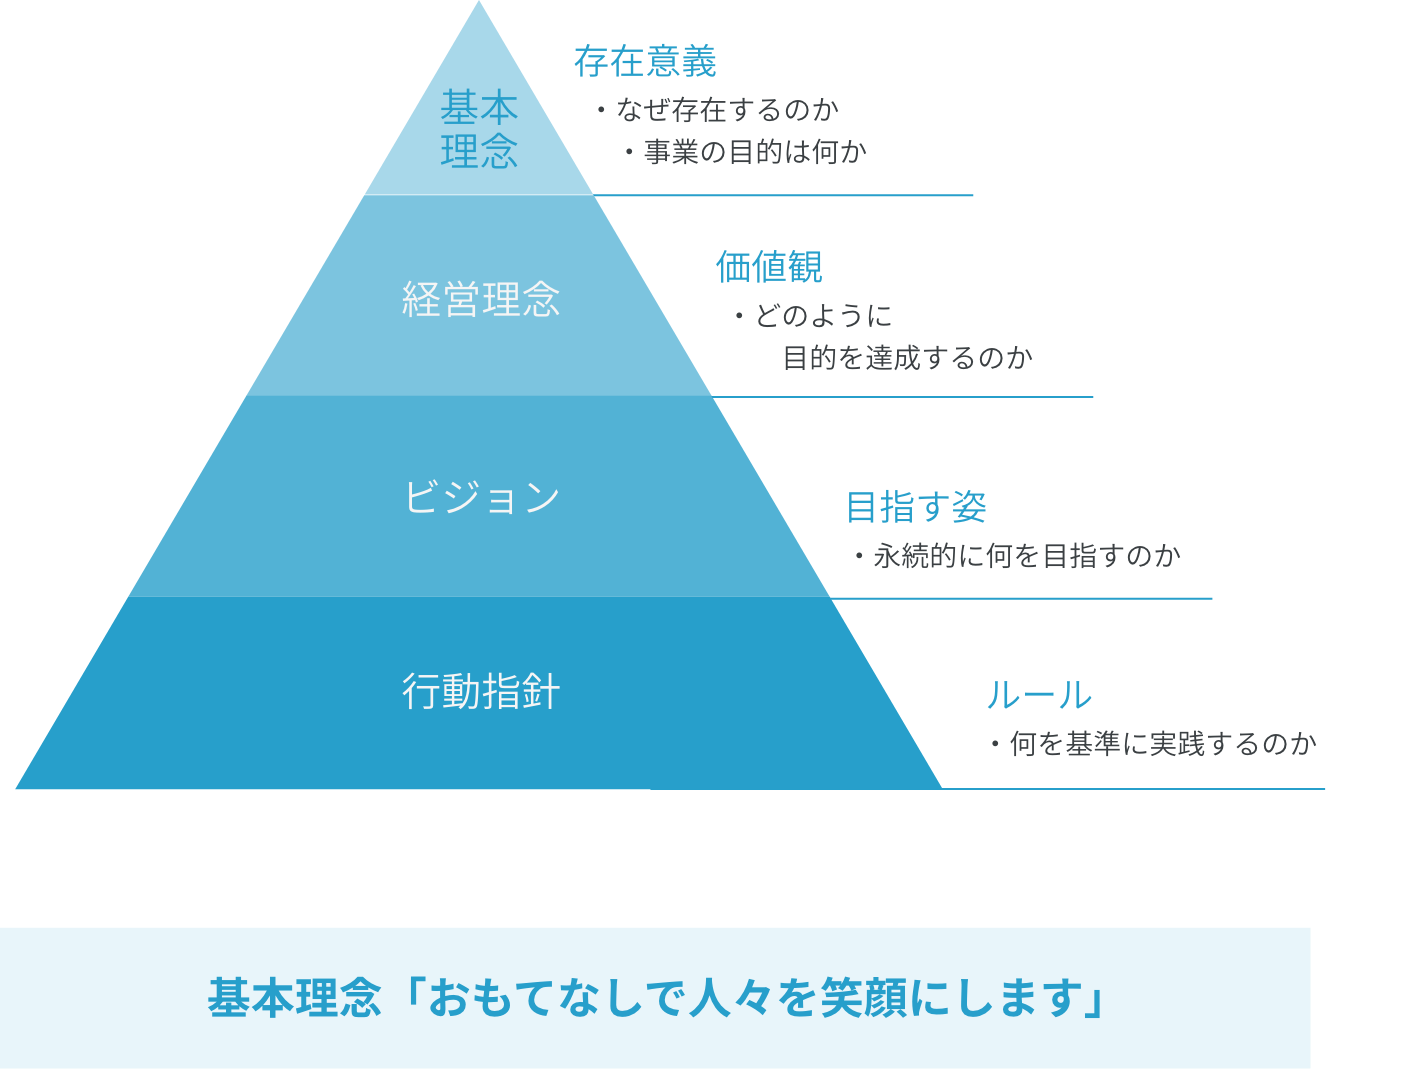 企業理念図